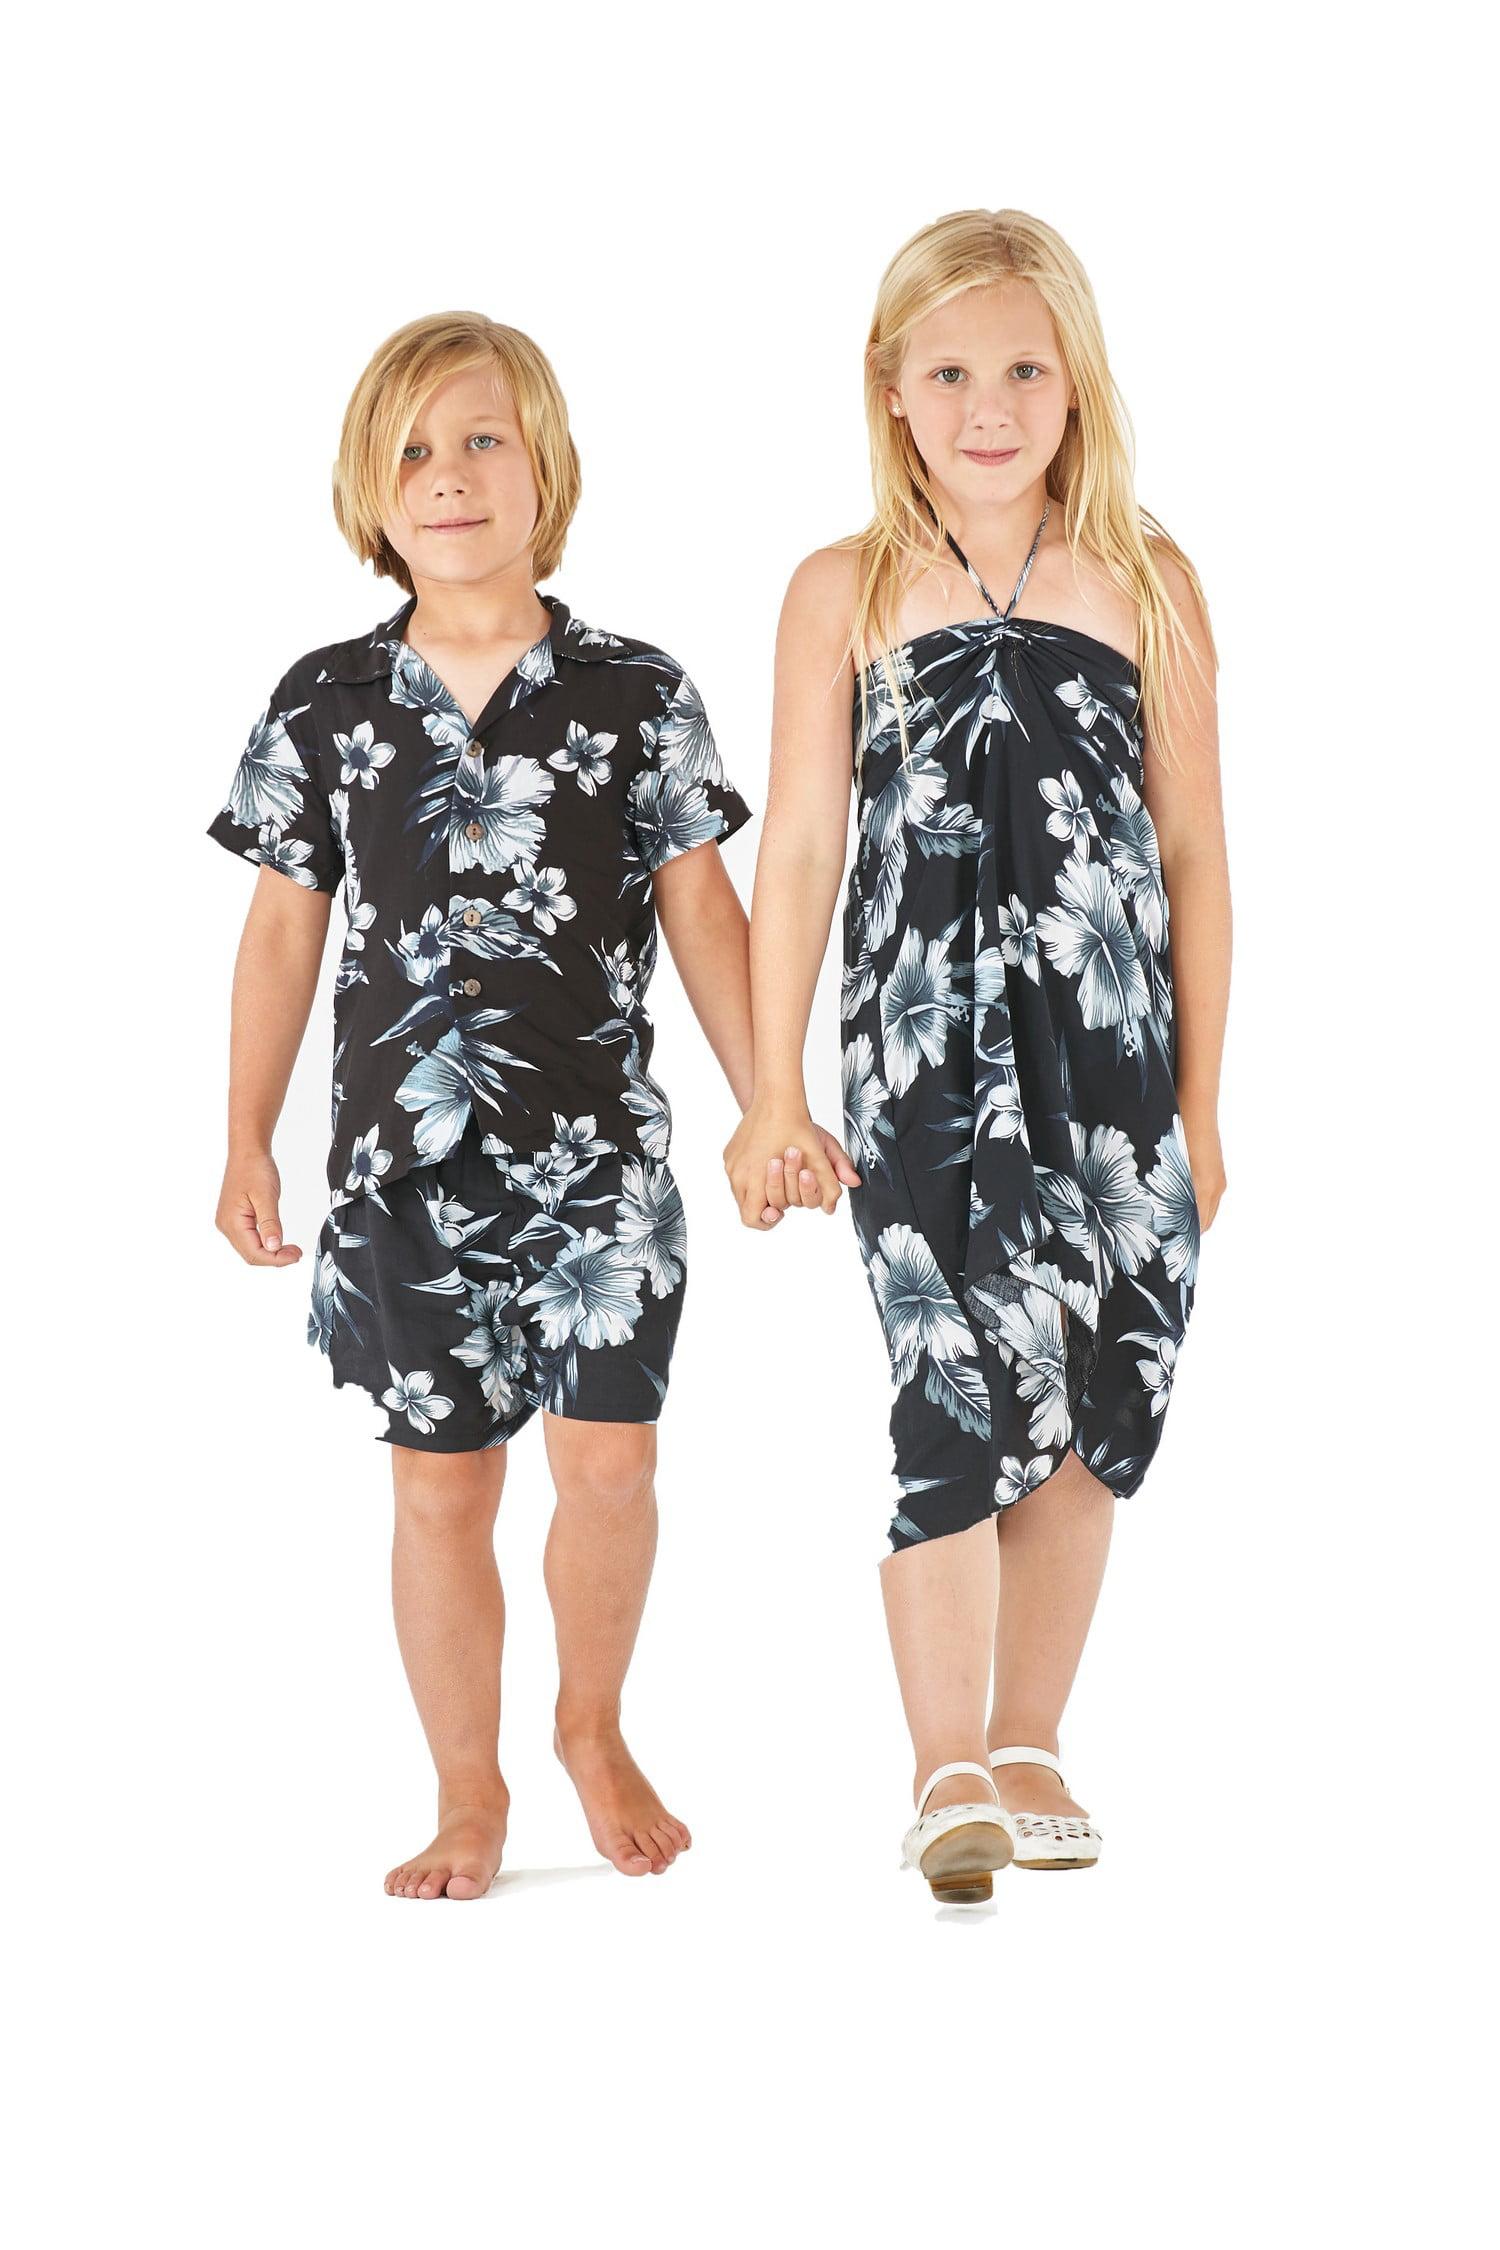 04cab08b44e6 Matching Boy and Girl Siblings Hawaiian Luau Outfits in Midnight ...